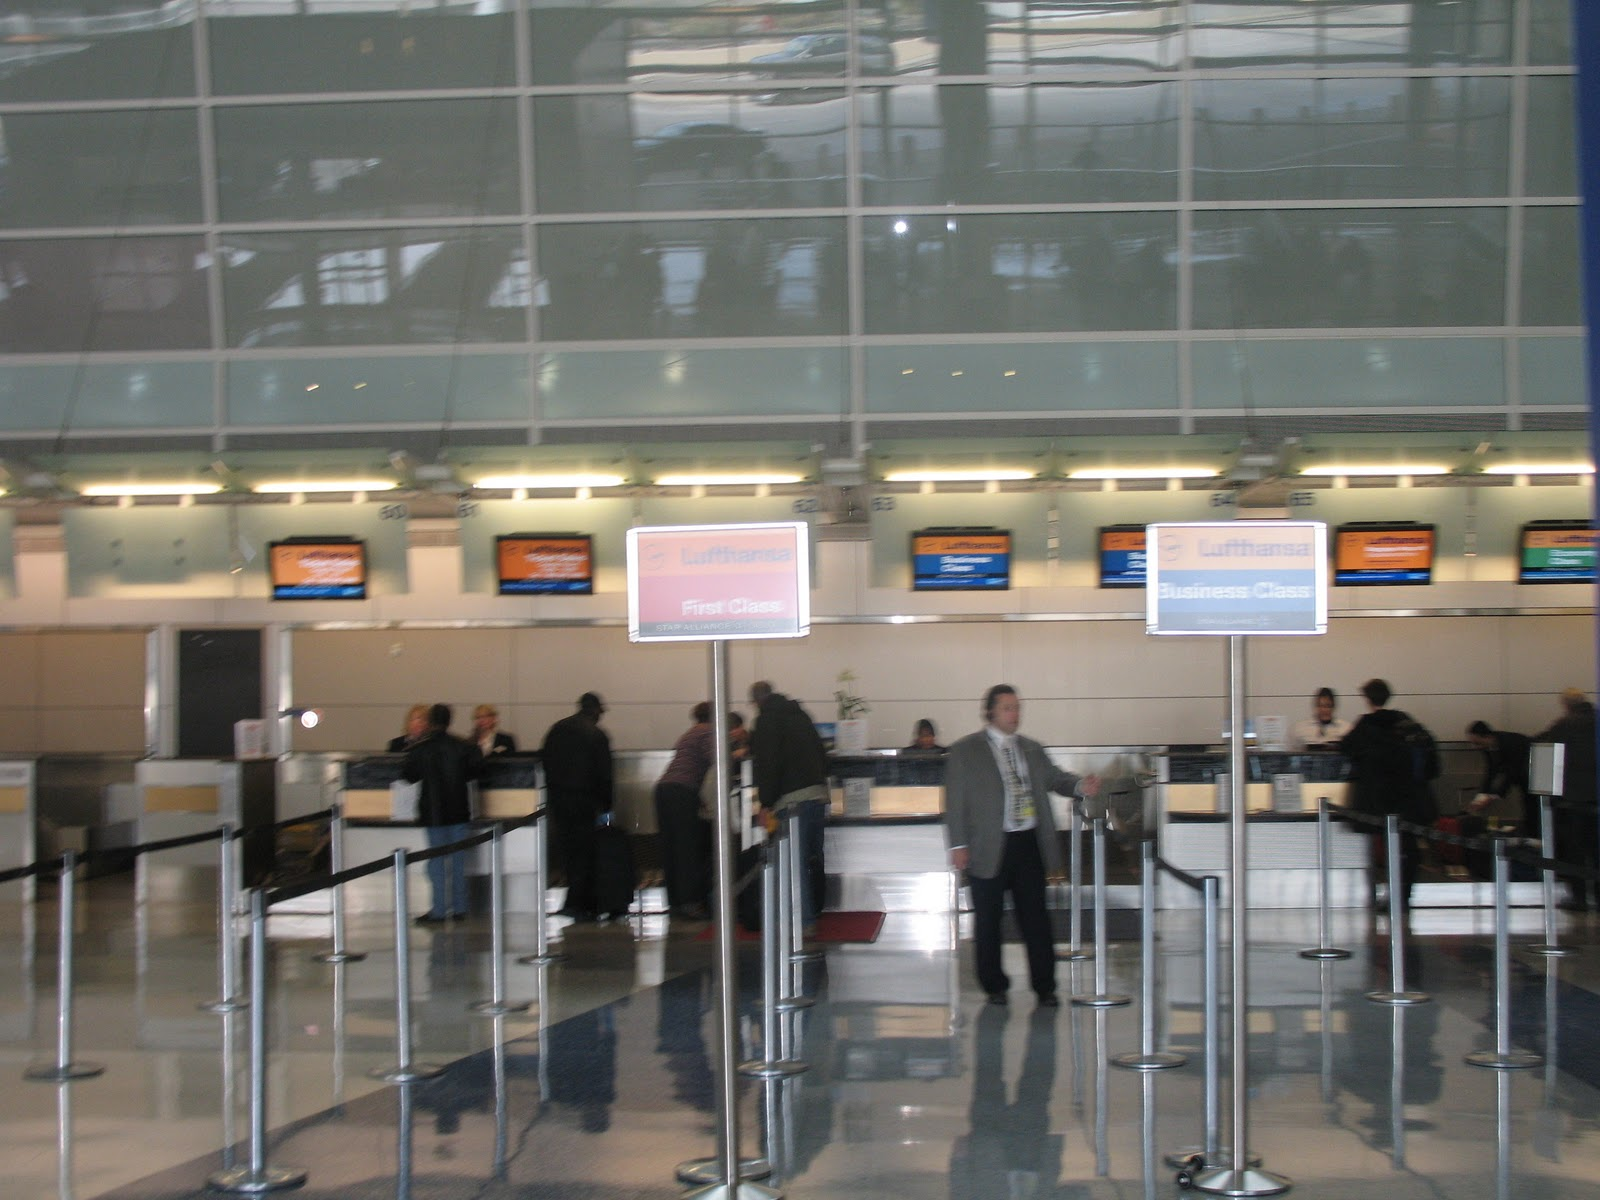 Closest casino to dfw airport